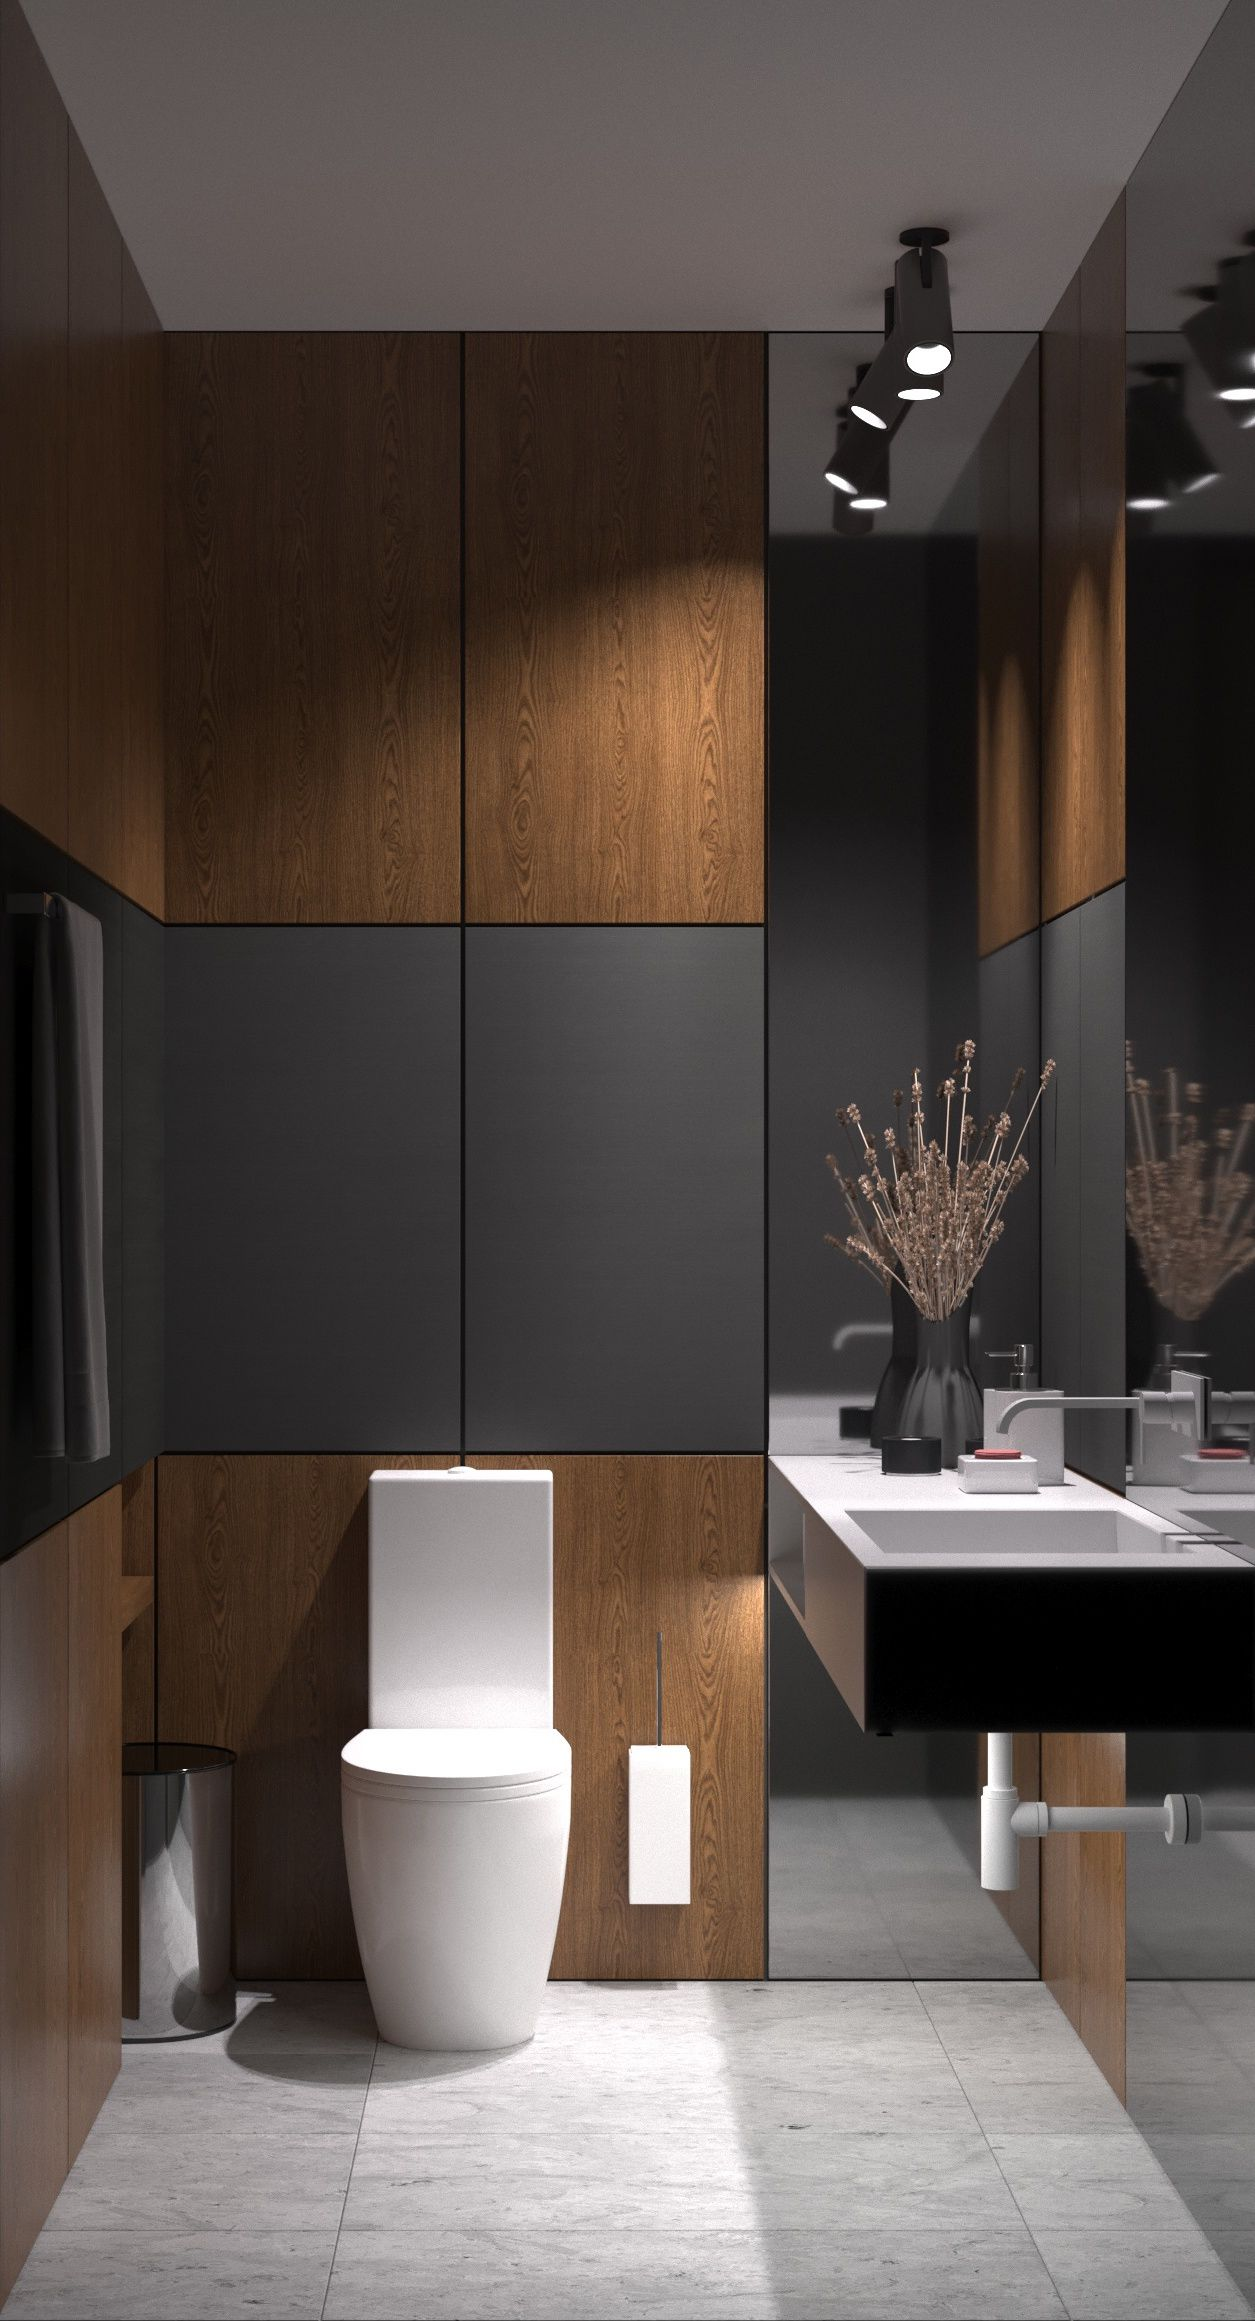 Toilet Design Small Organization Ideas